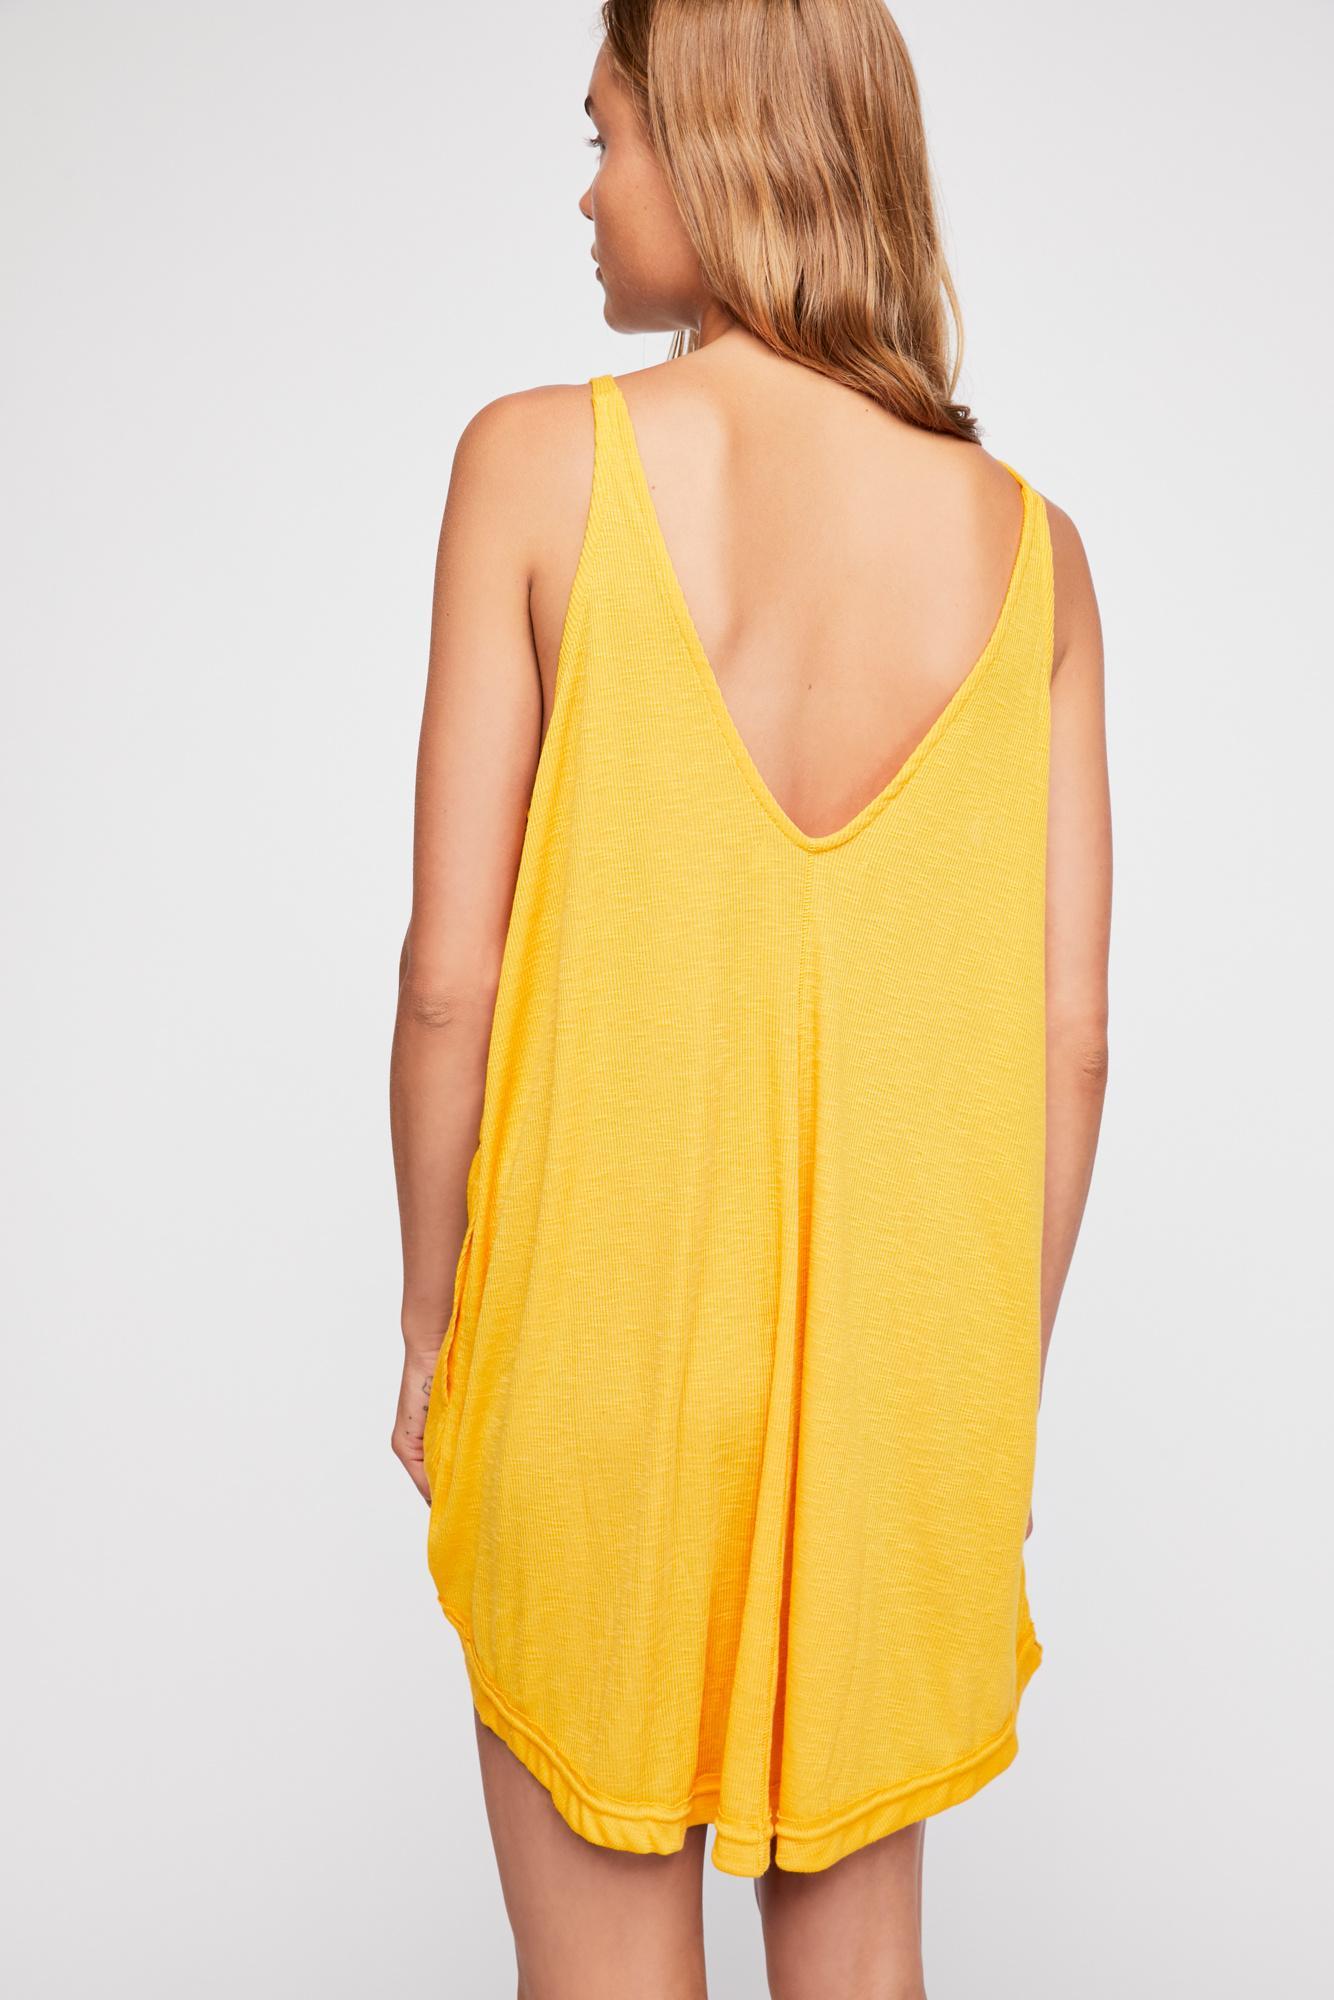 d0937da8c6 Free People - Yellow Clovers Mini Dress By Fp Beach - Lyst. View fullscreen